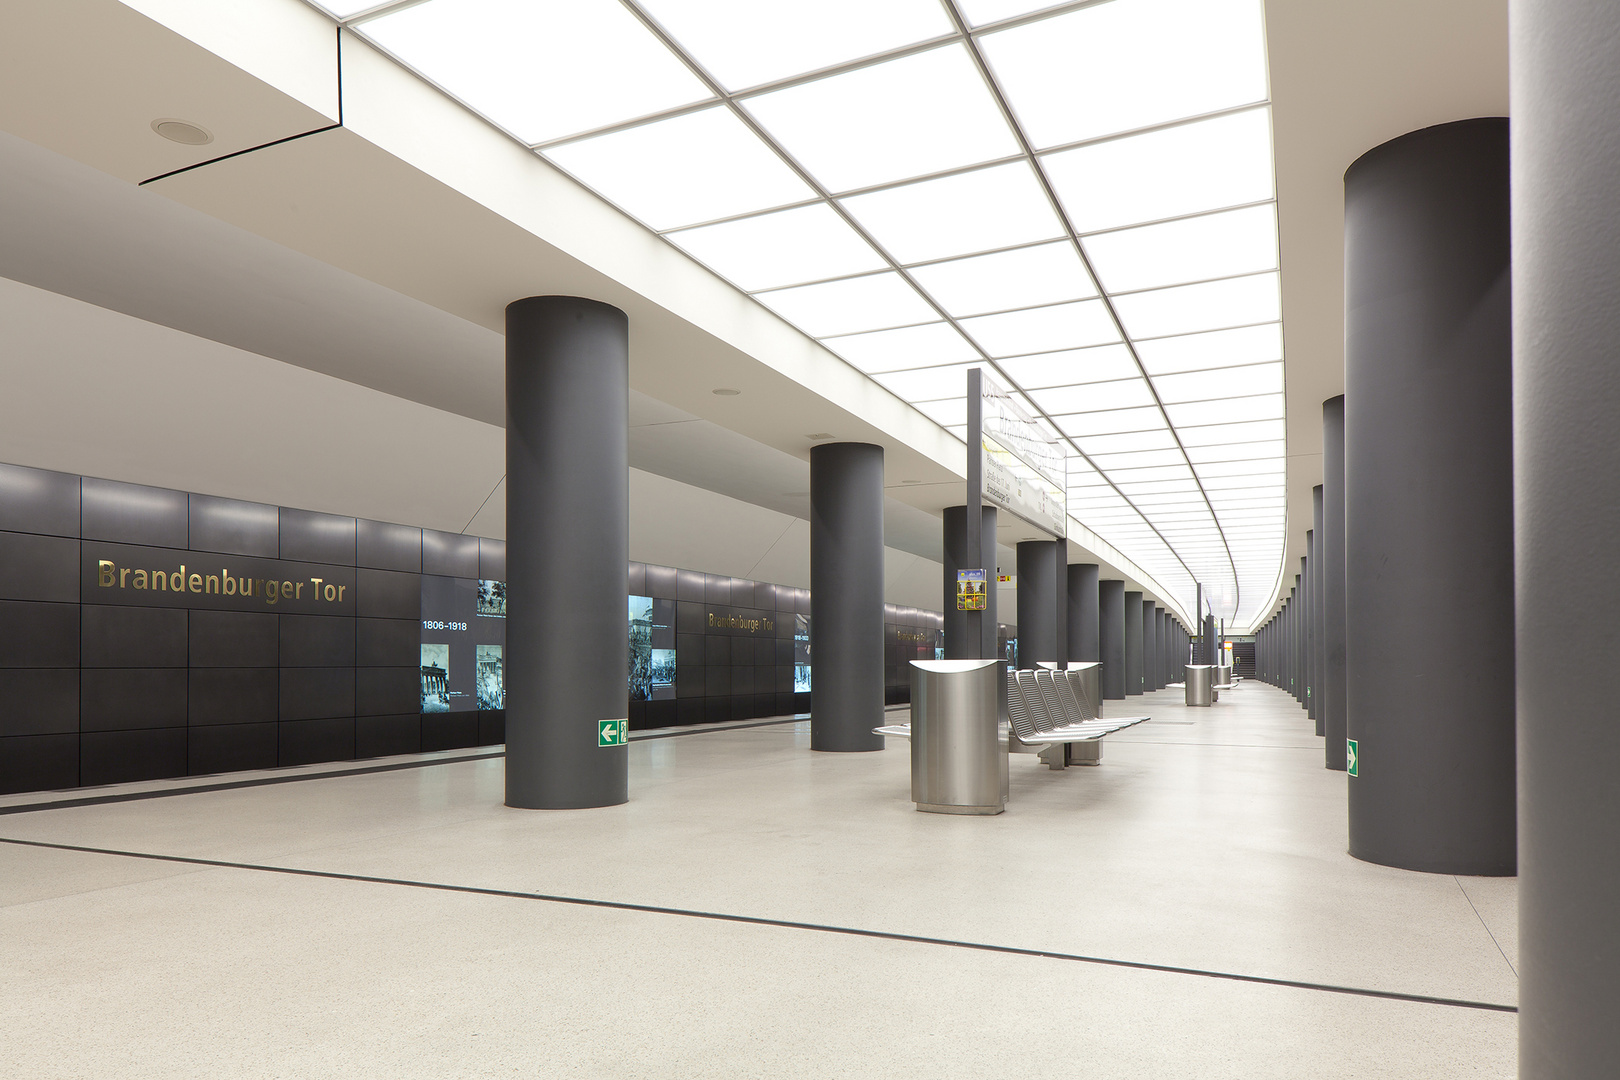 U-Bahnhof Brandenburger Tor